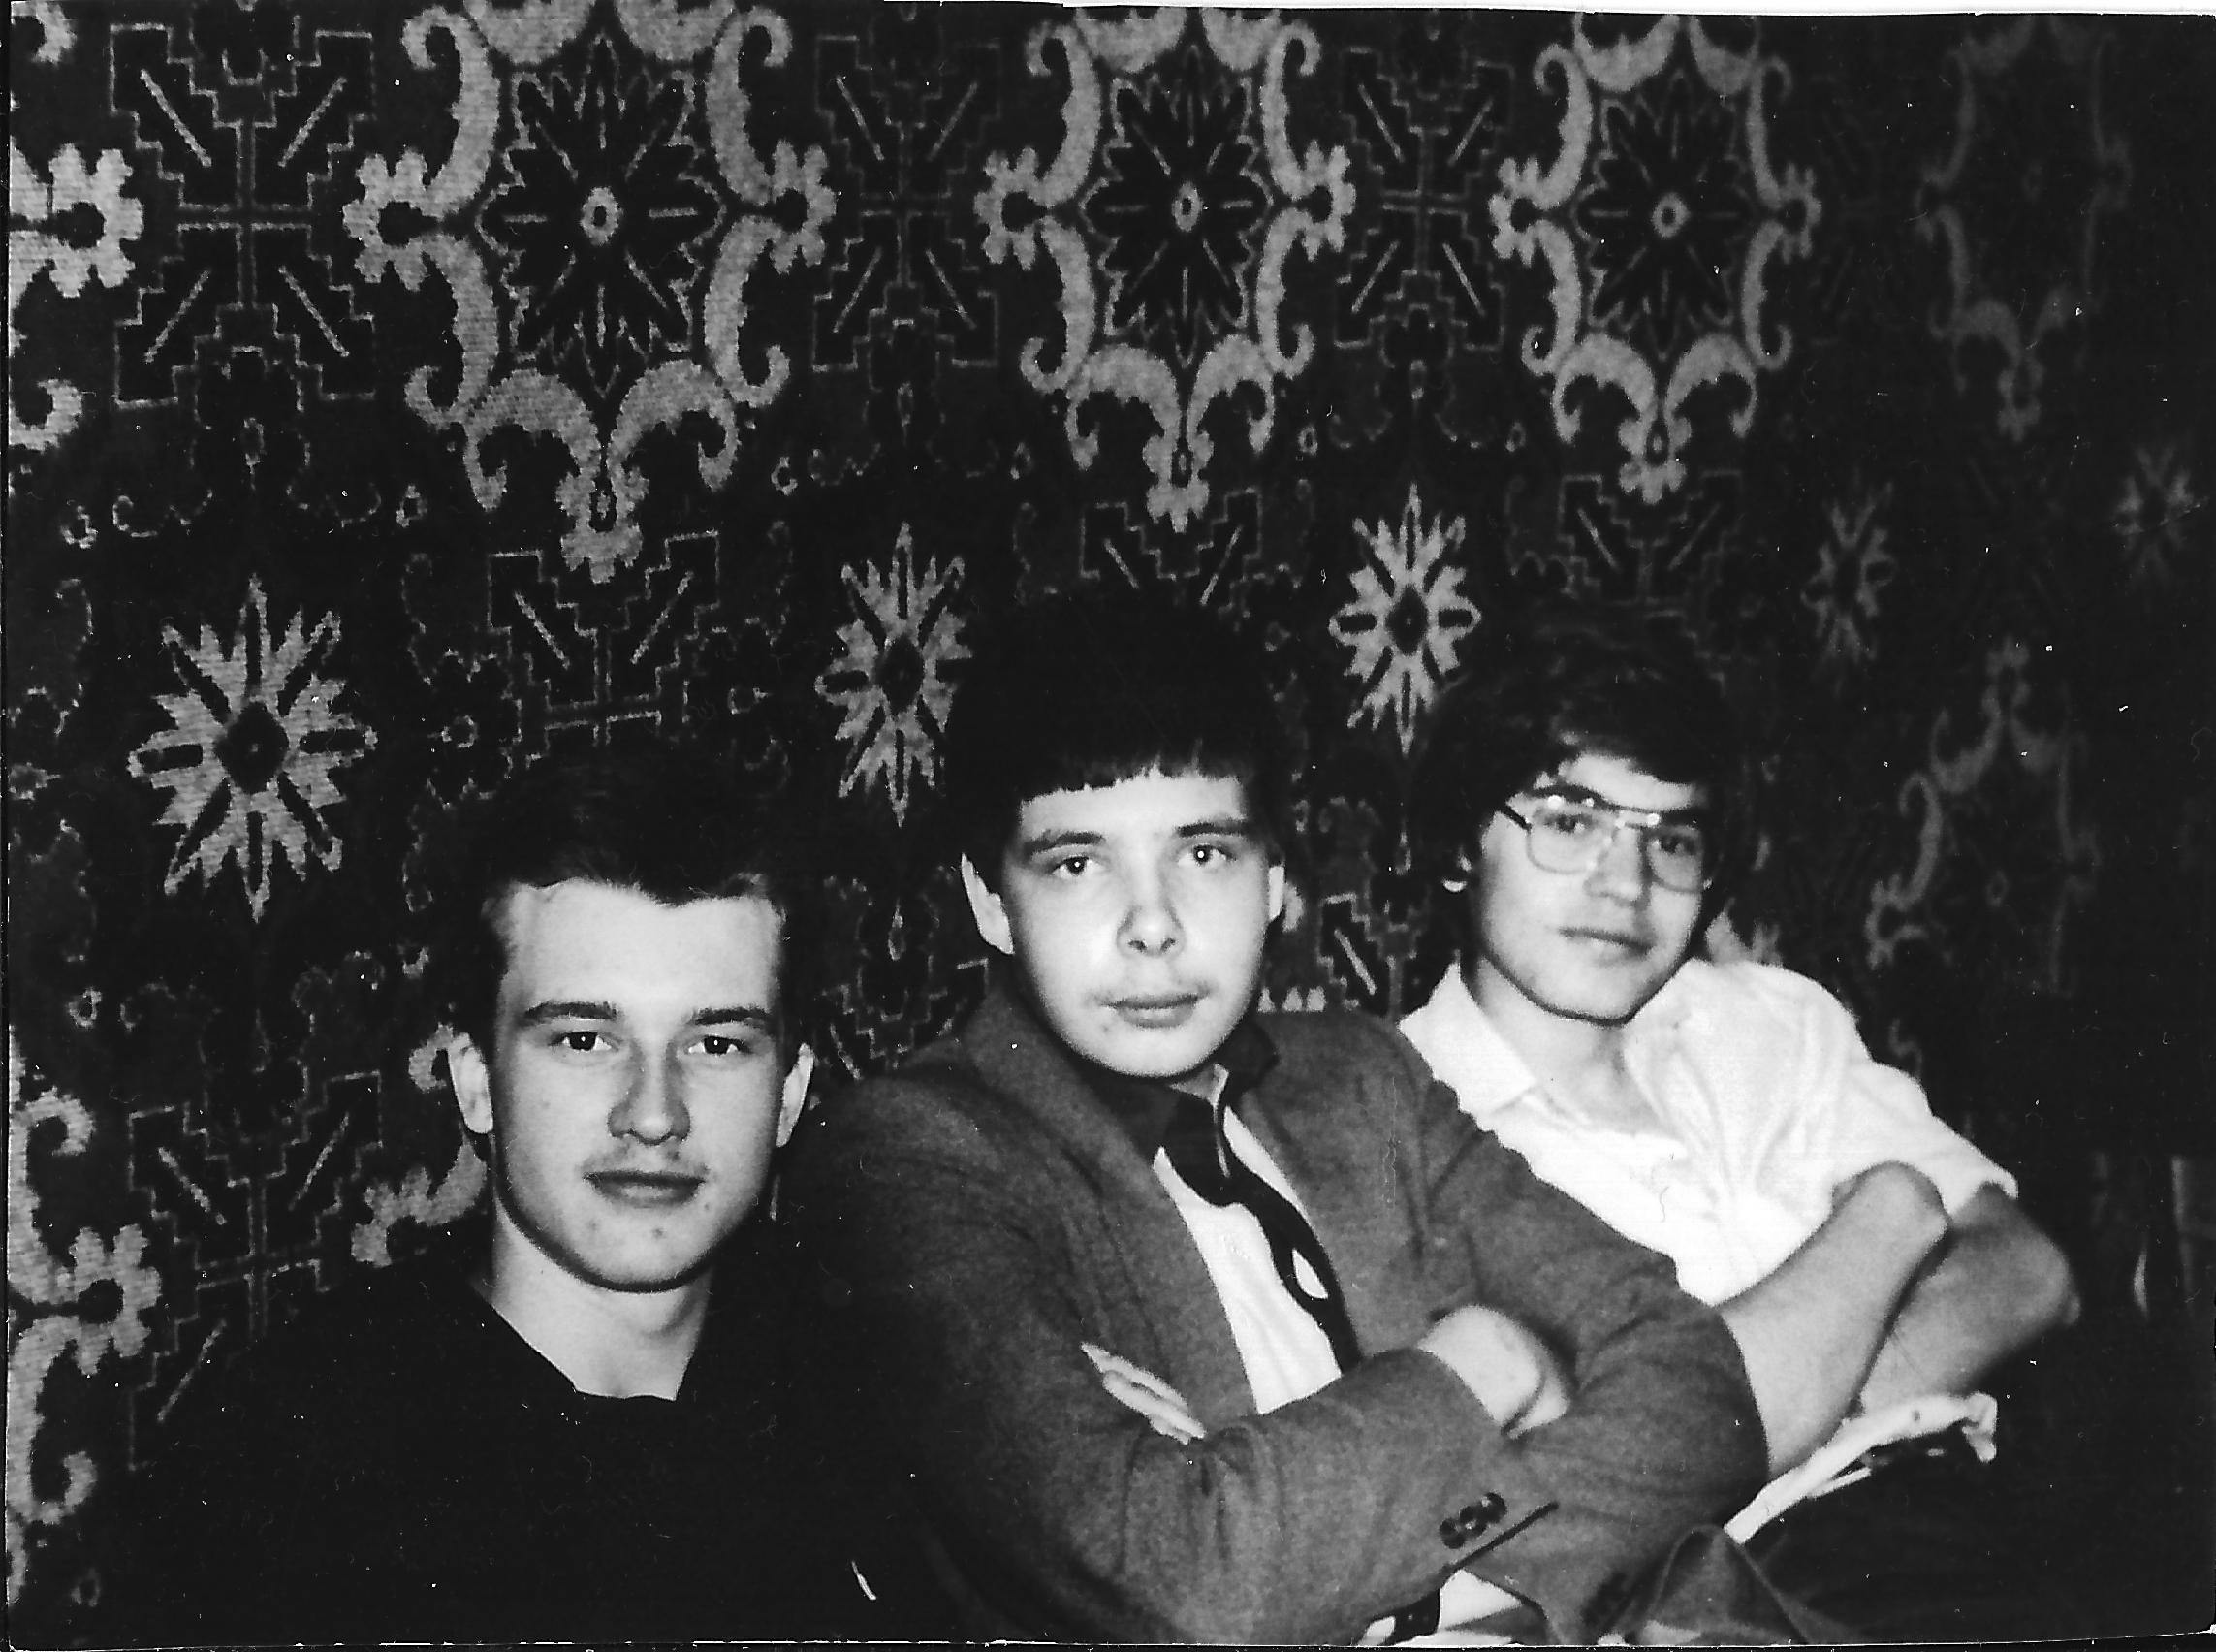 Участники ASP Corp. Слева направо: Александр Гречишкин, Сергей Фоменко, Павел Успенский